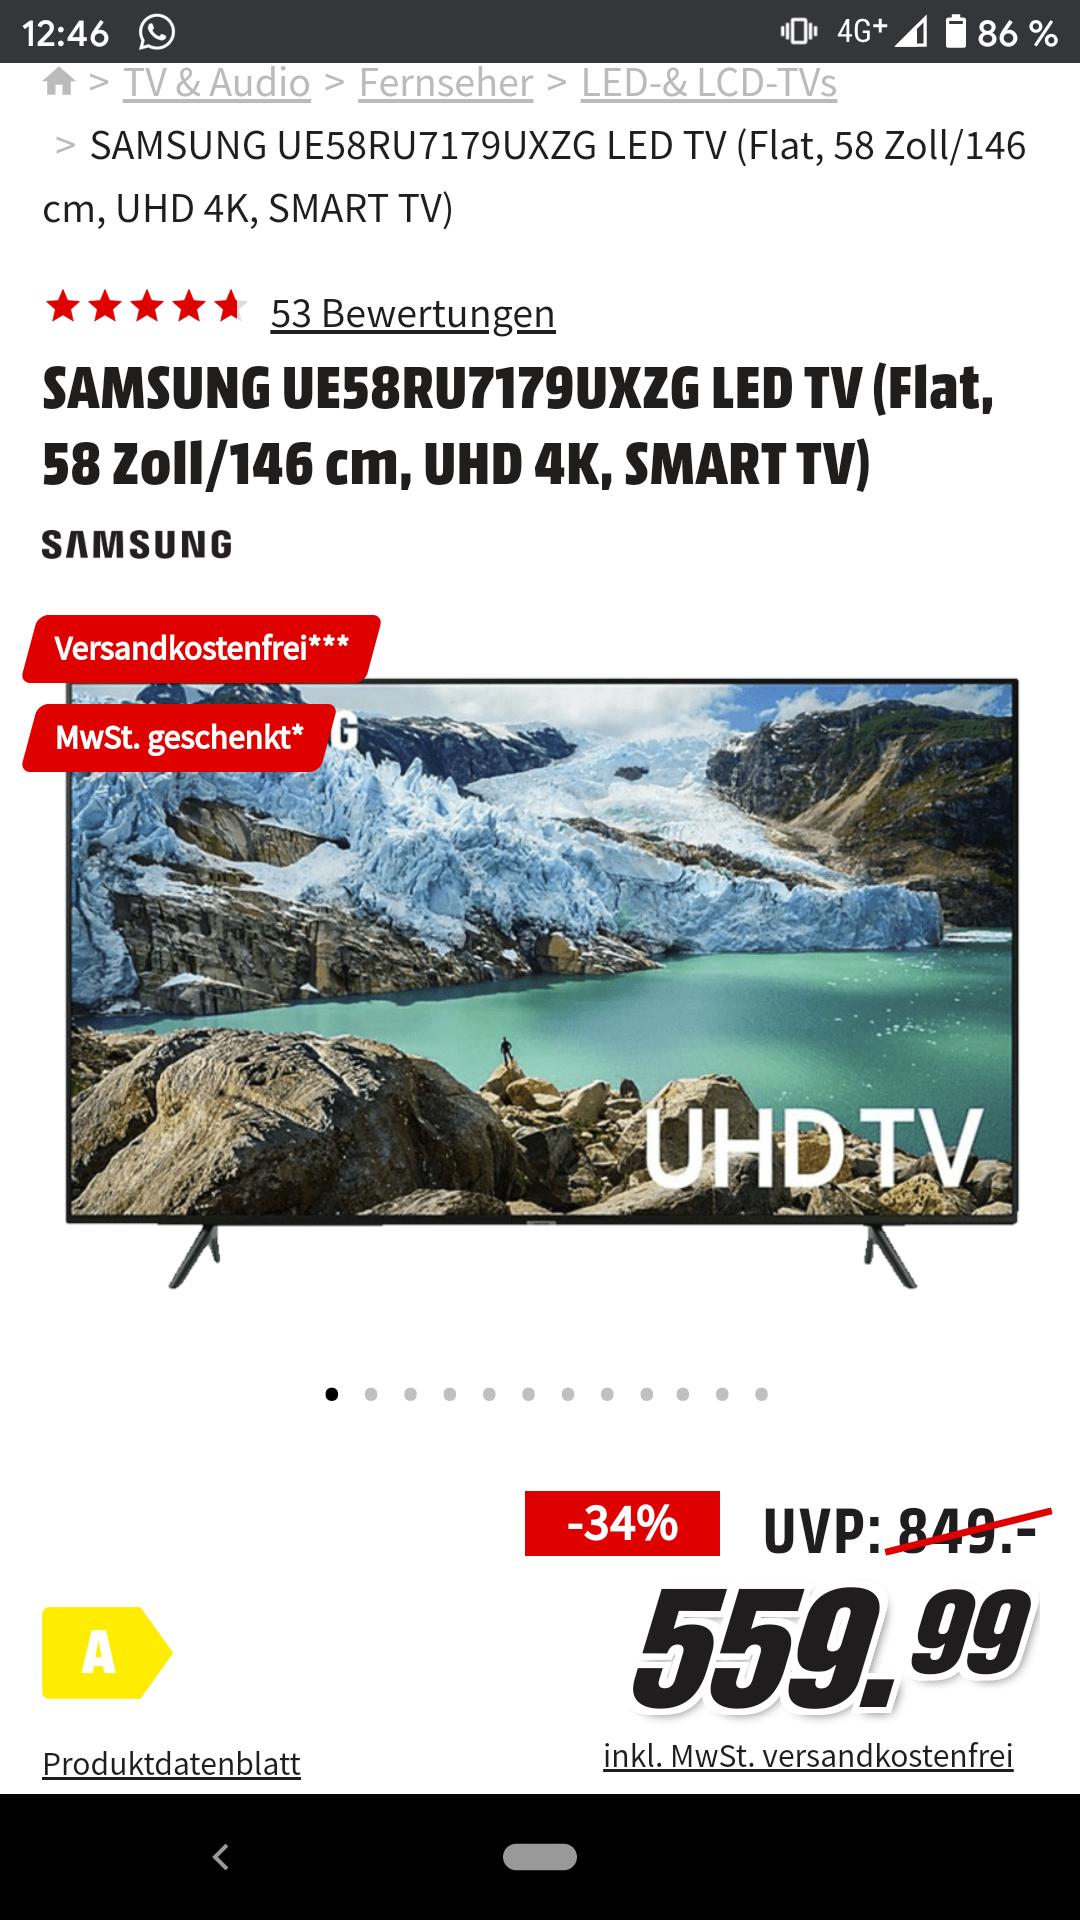 Mediamarkt: SAMSUNG UE58RU7179UXZG LED TV (Flat, 58 Zoll/146 cm, UHD 4K, SMART TV)